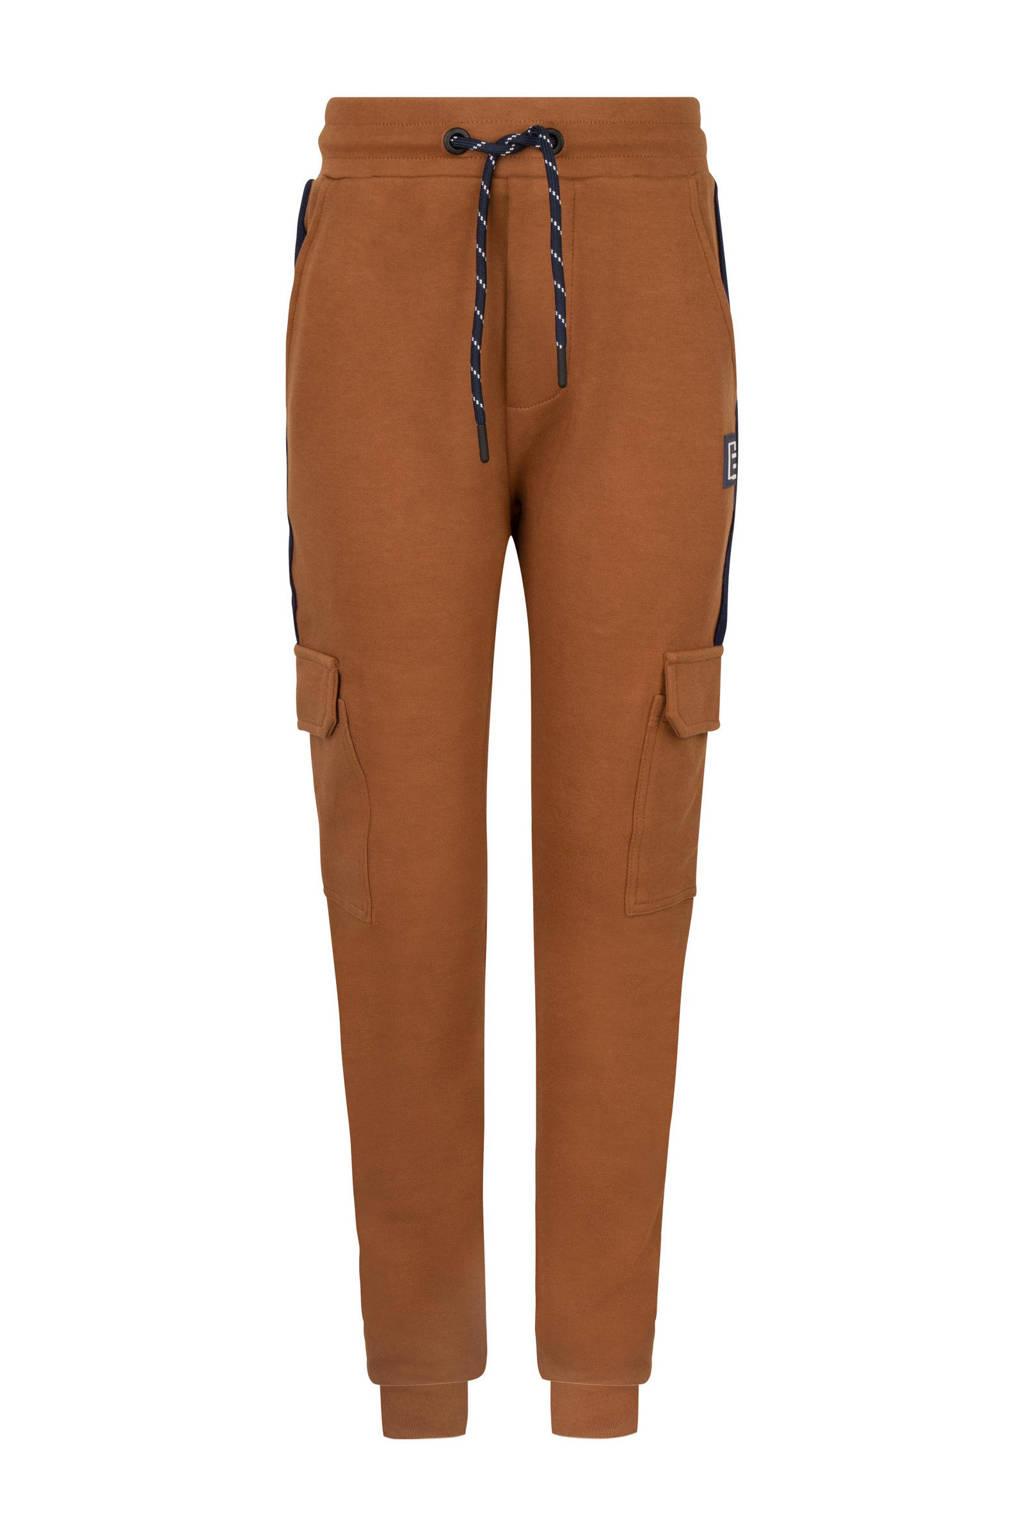 Indian Blue Jeans skinny joggingbroek cognac, Cognac